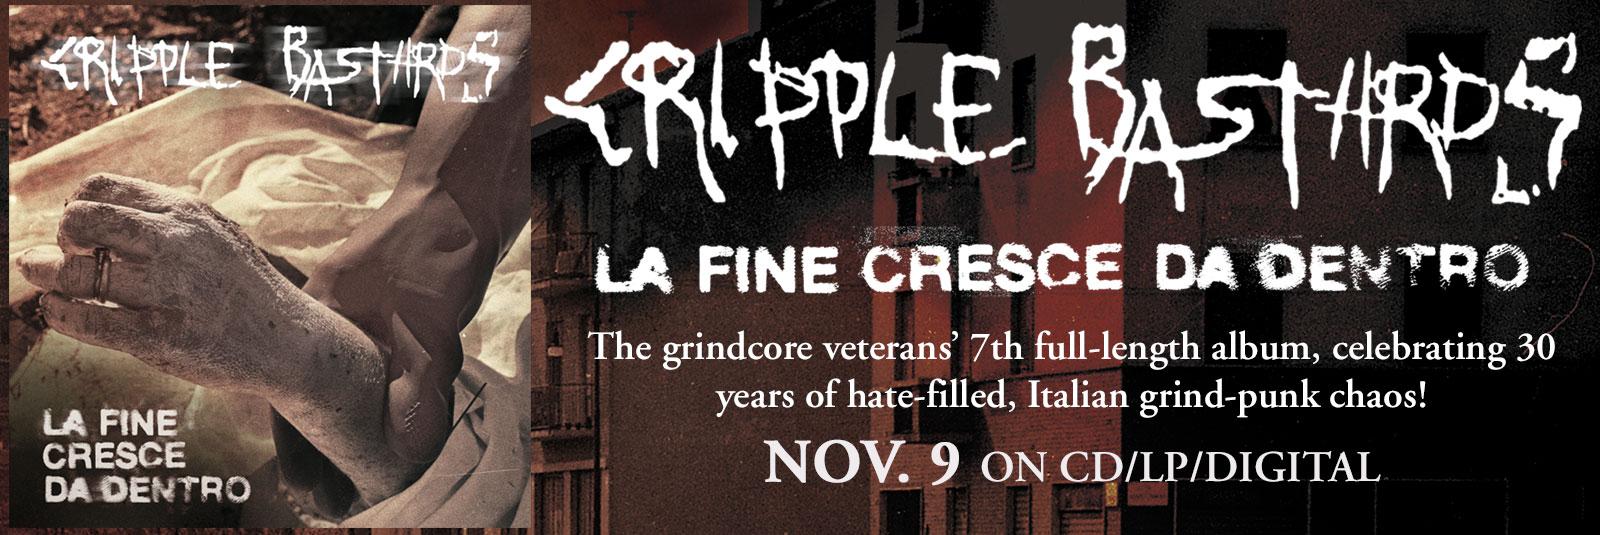 Cripple-bastards-la-fine-cresce-da-dentro-grindcore-relapse-november-9